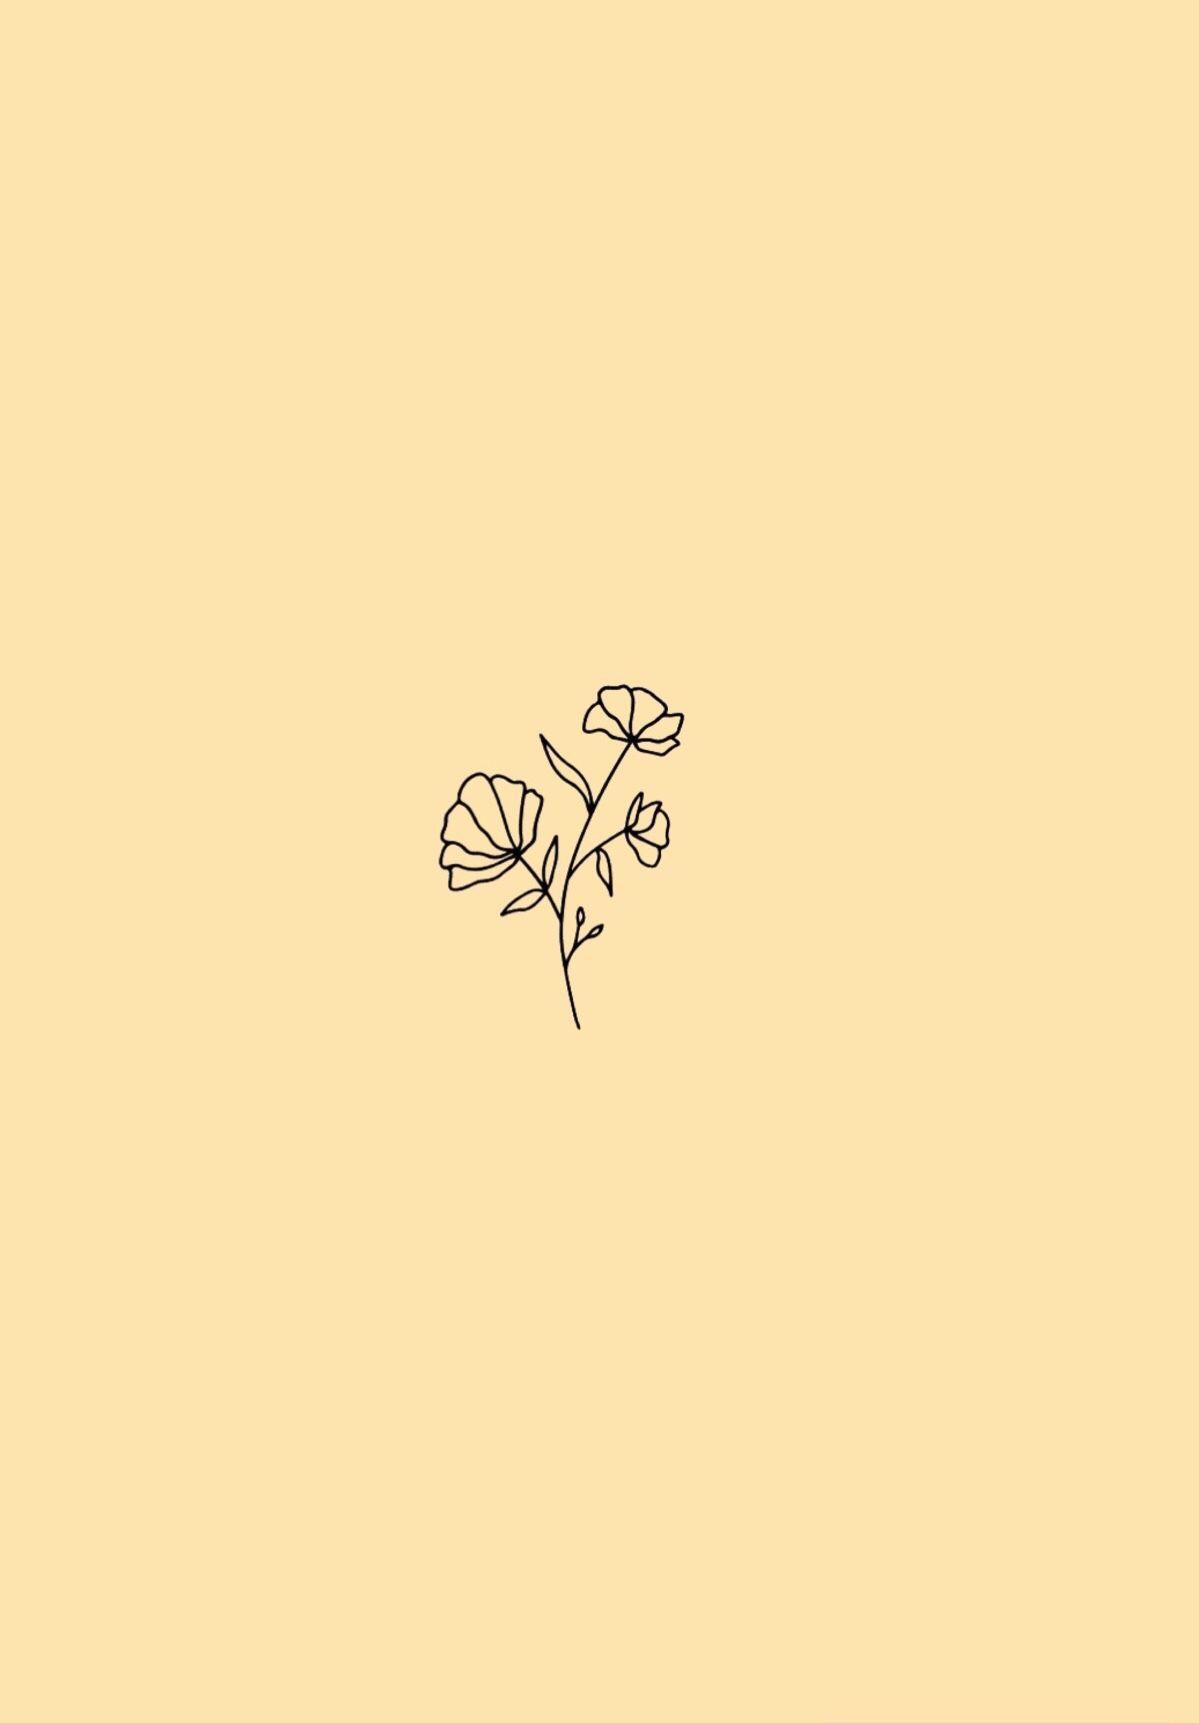 minimalist flower wallpaper pastel yellow background in